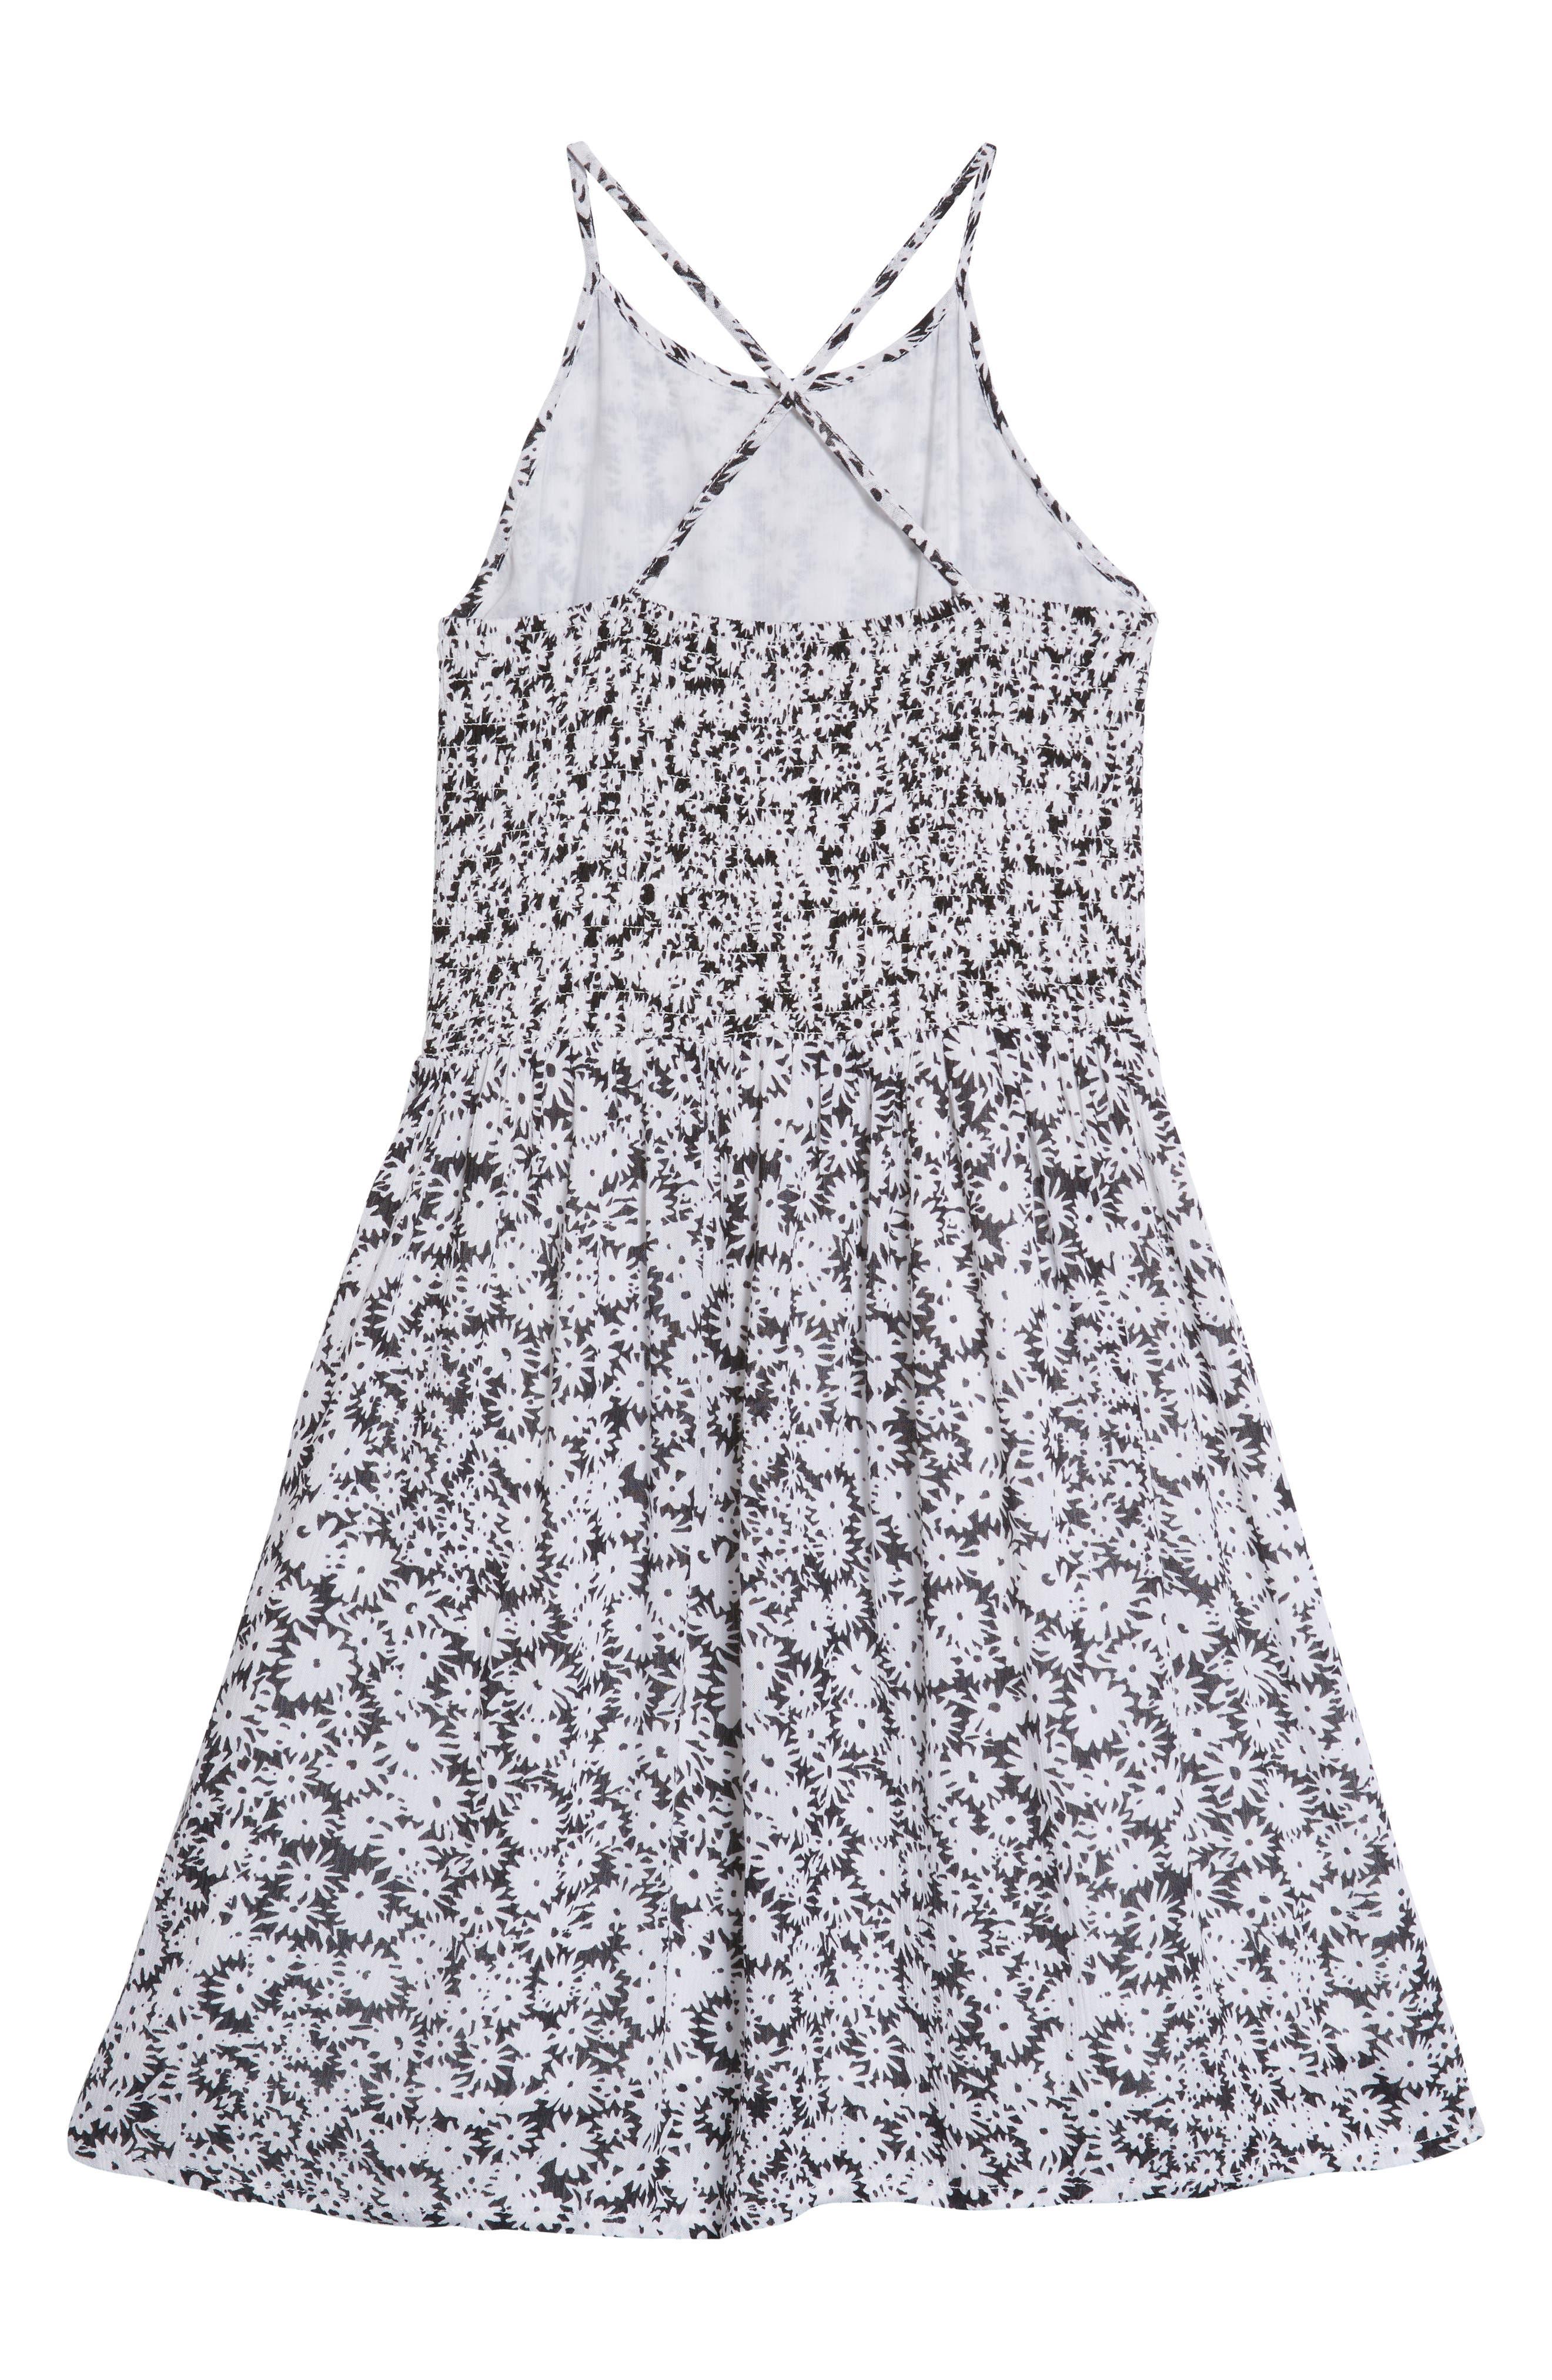 Smocked Dress,                             Alternate thumbnail 2, color,                             001